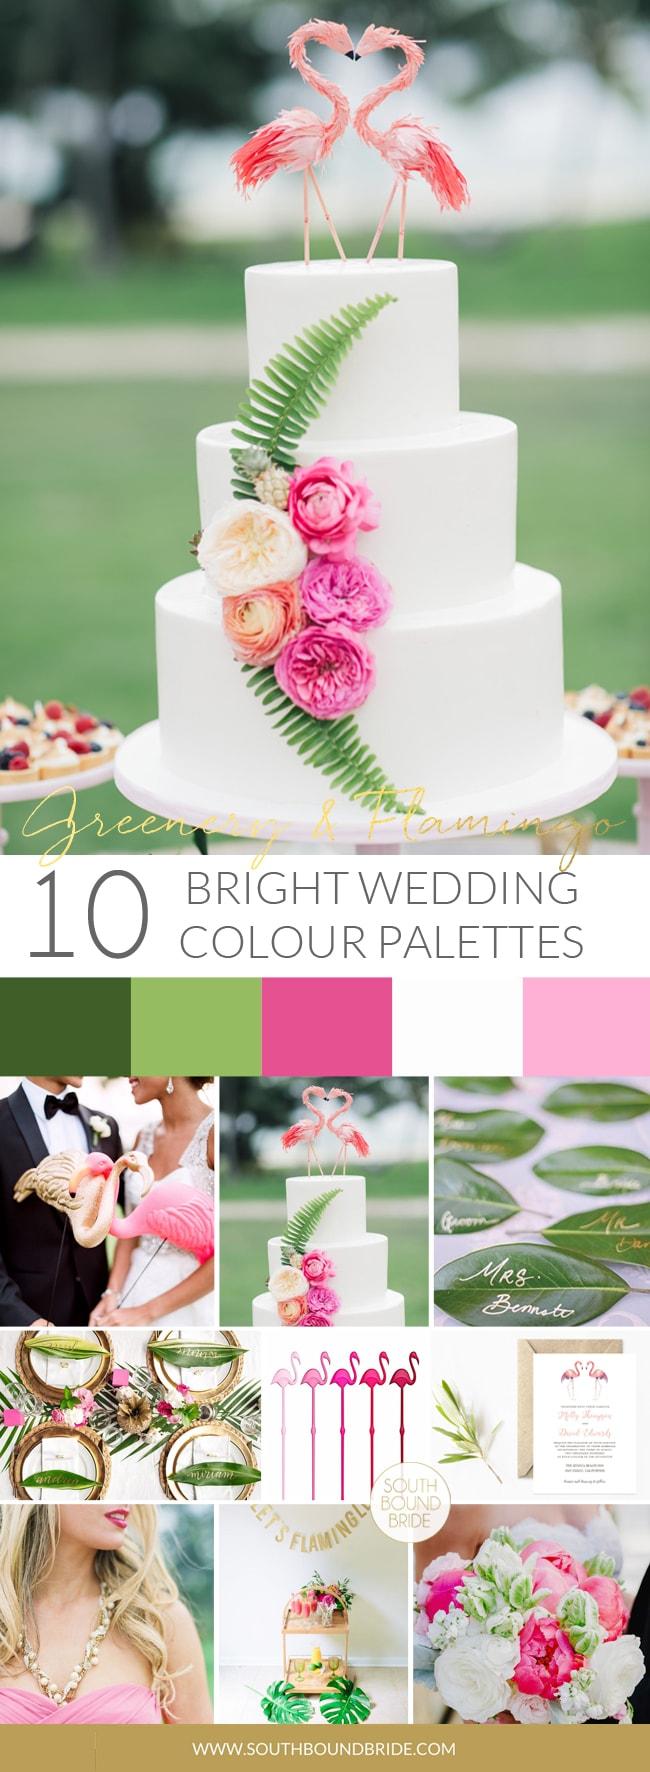 Pantone Greenery Inspiration Board: Greenery & Flamingo   SouthBound Bride